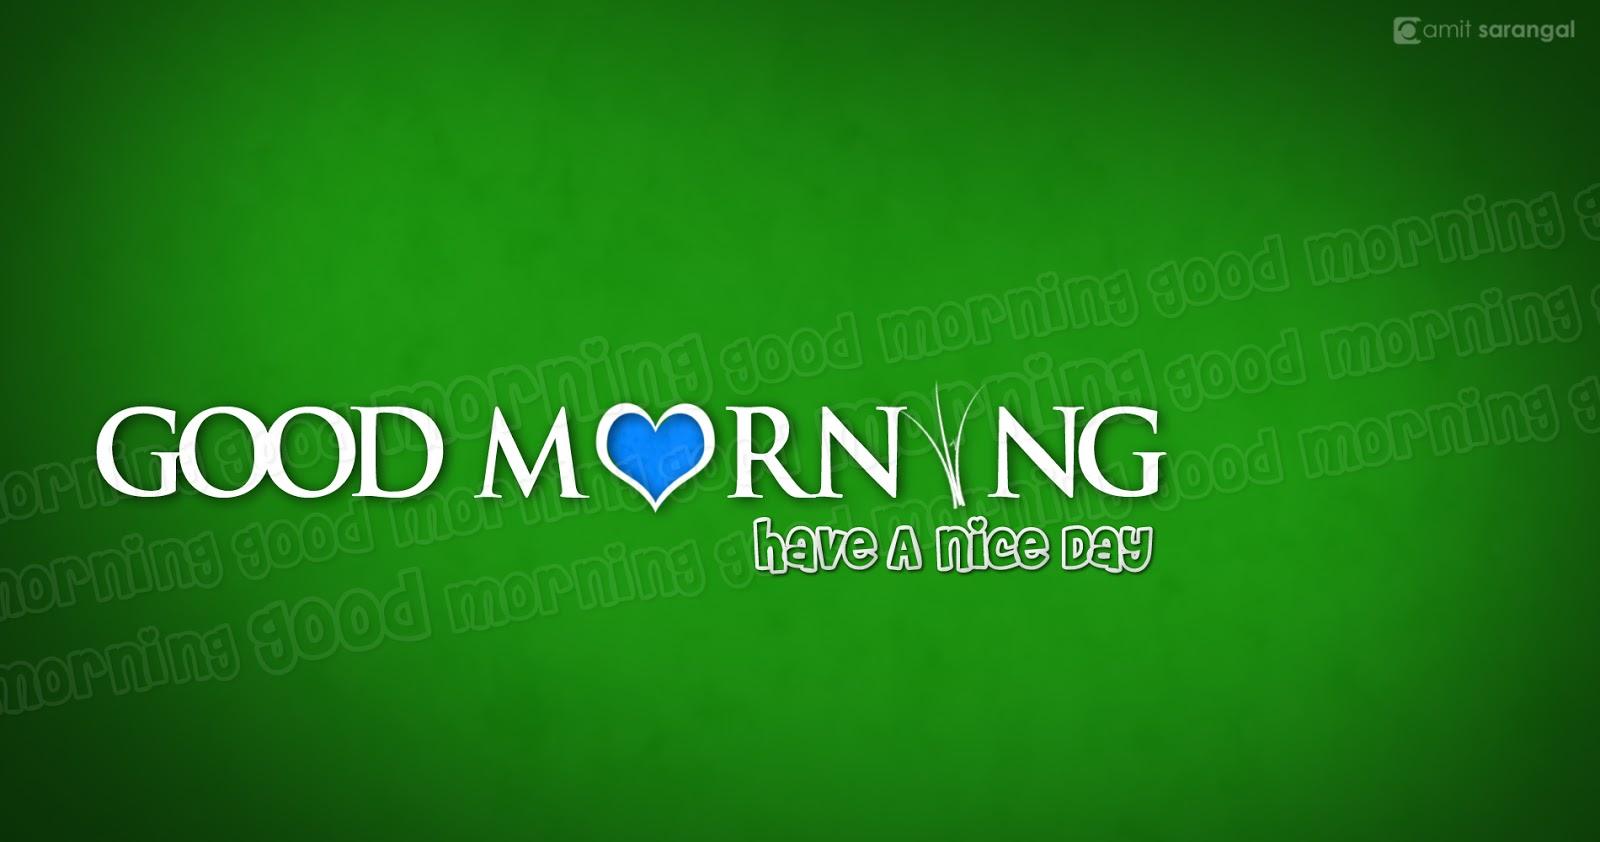 Good Morning 5 | Amit Sarangal